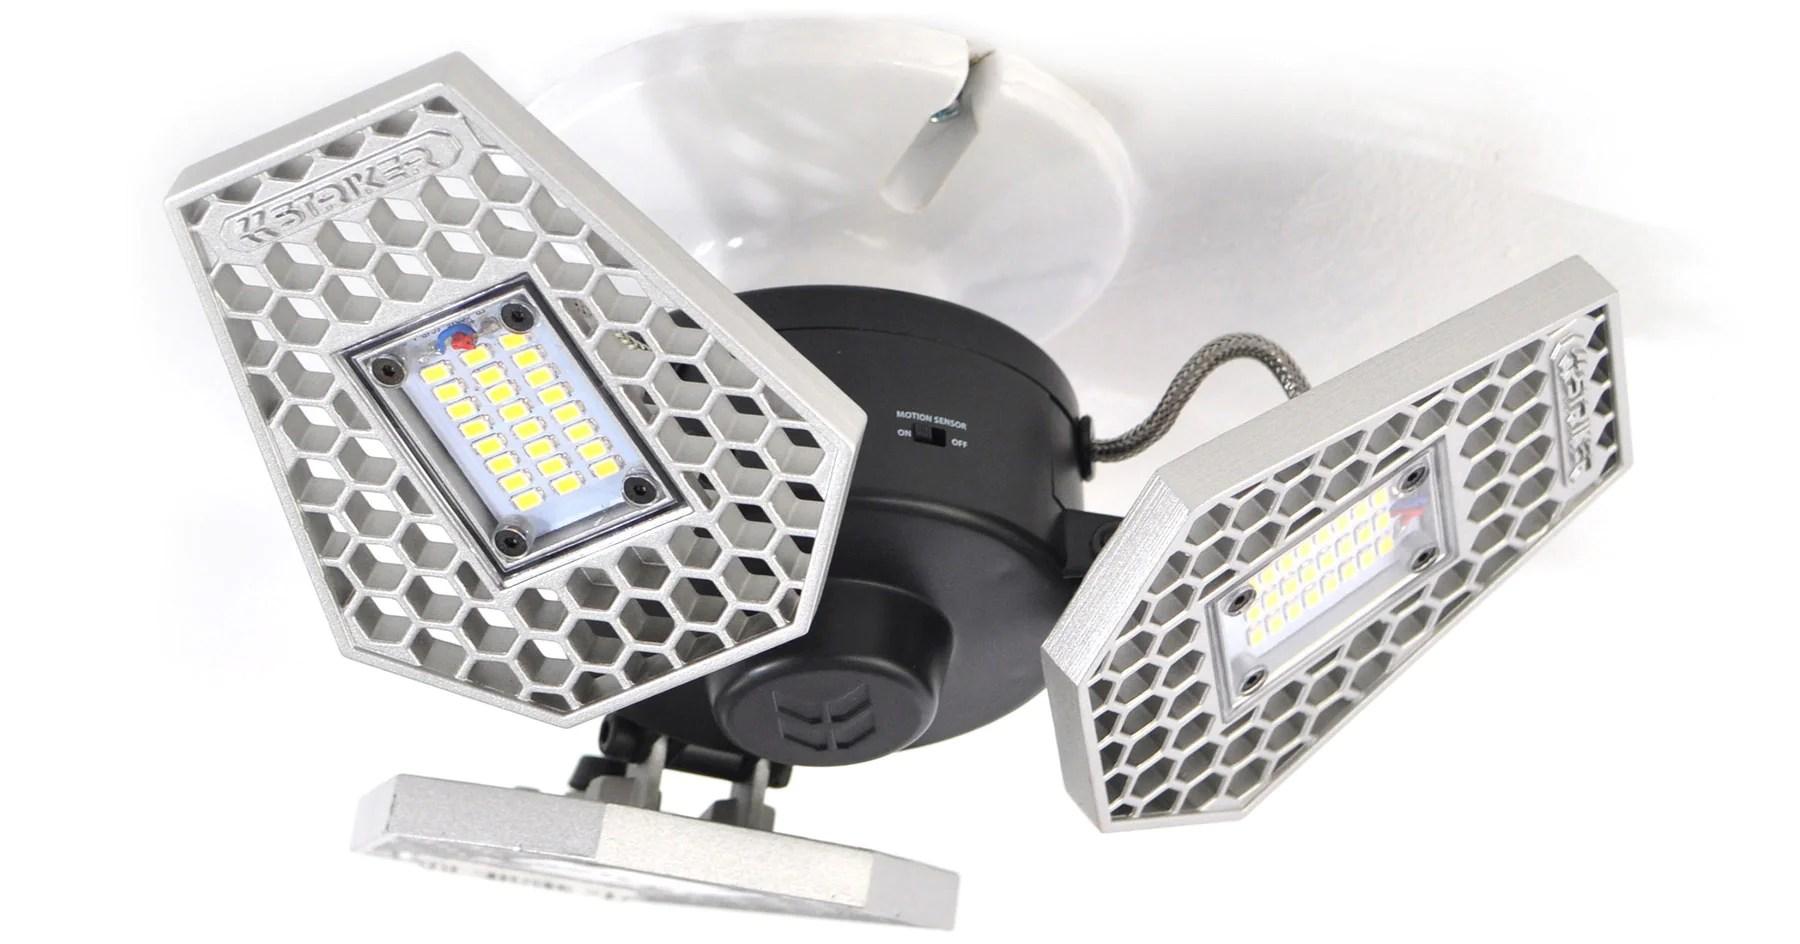 trilight motion activated ceiling light [ 1800 x 944 Pixel ]